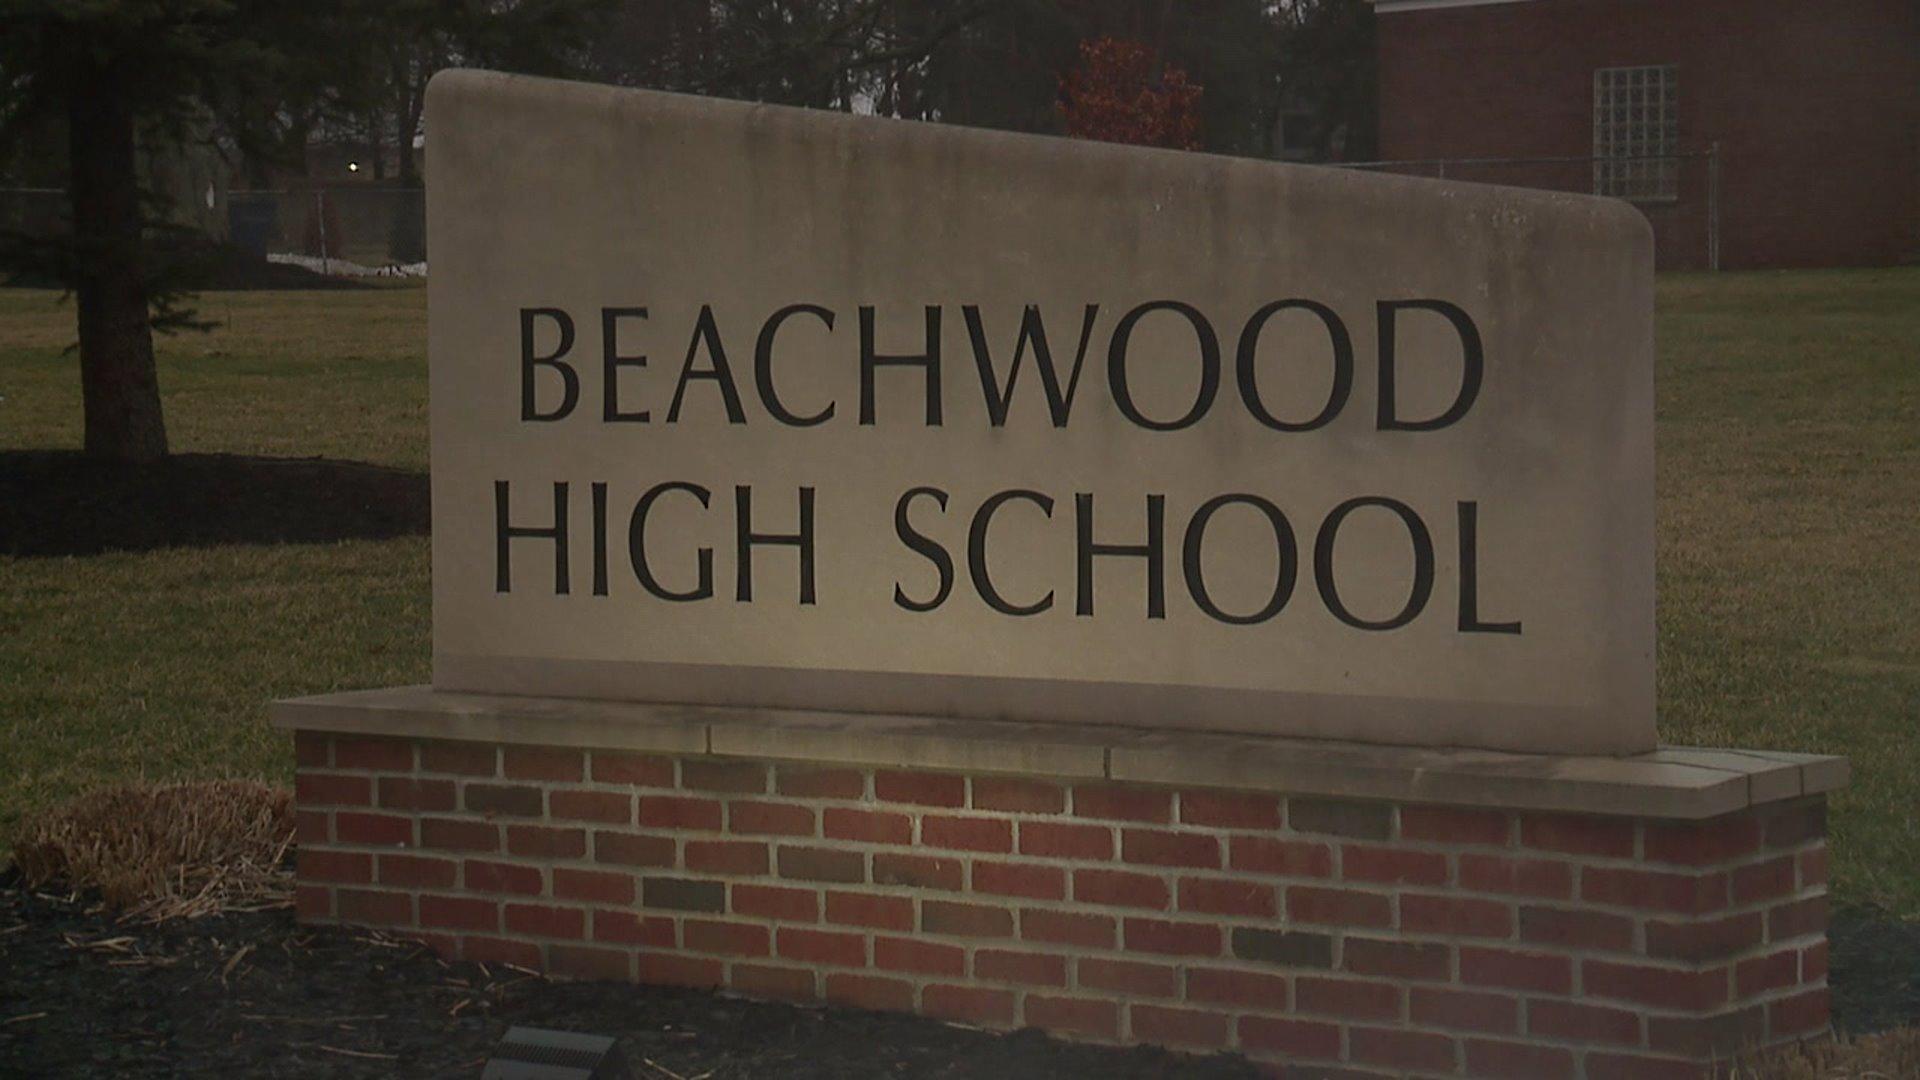 Beachwood High School